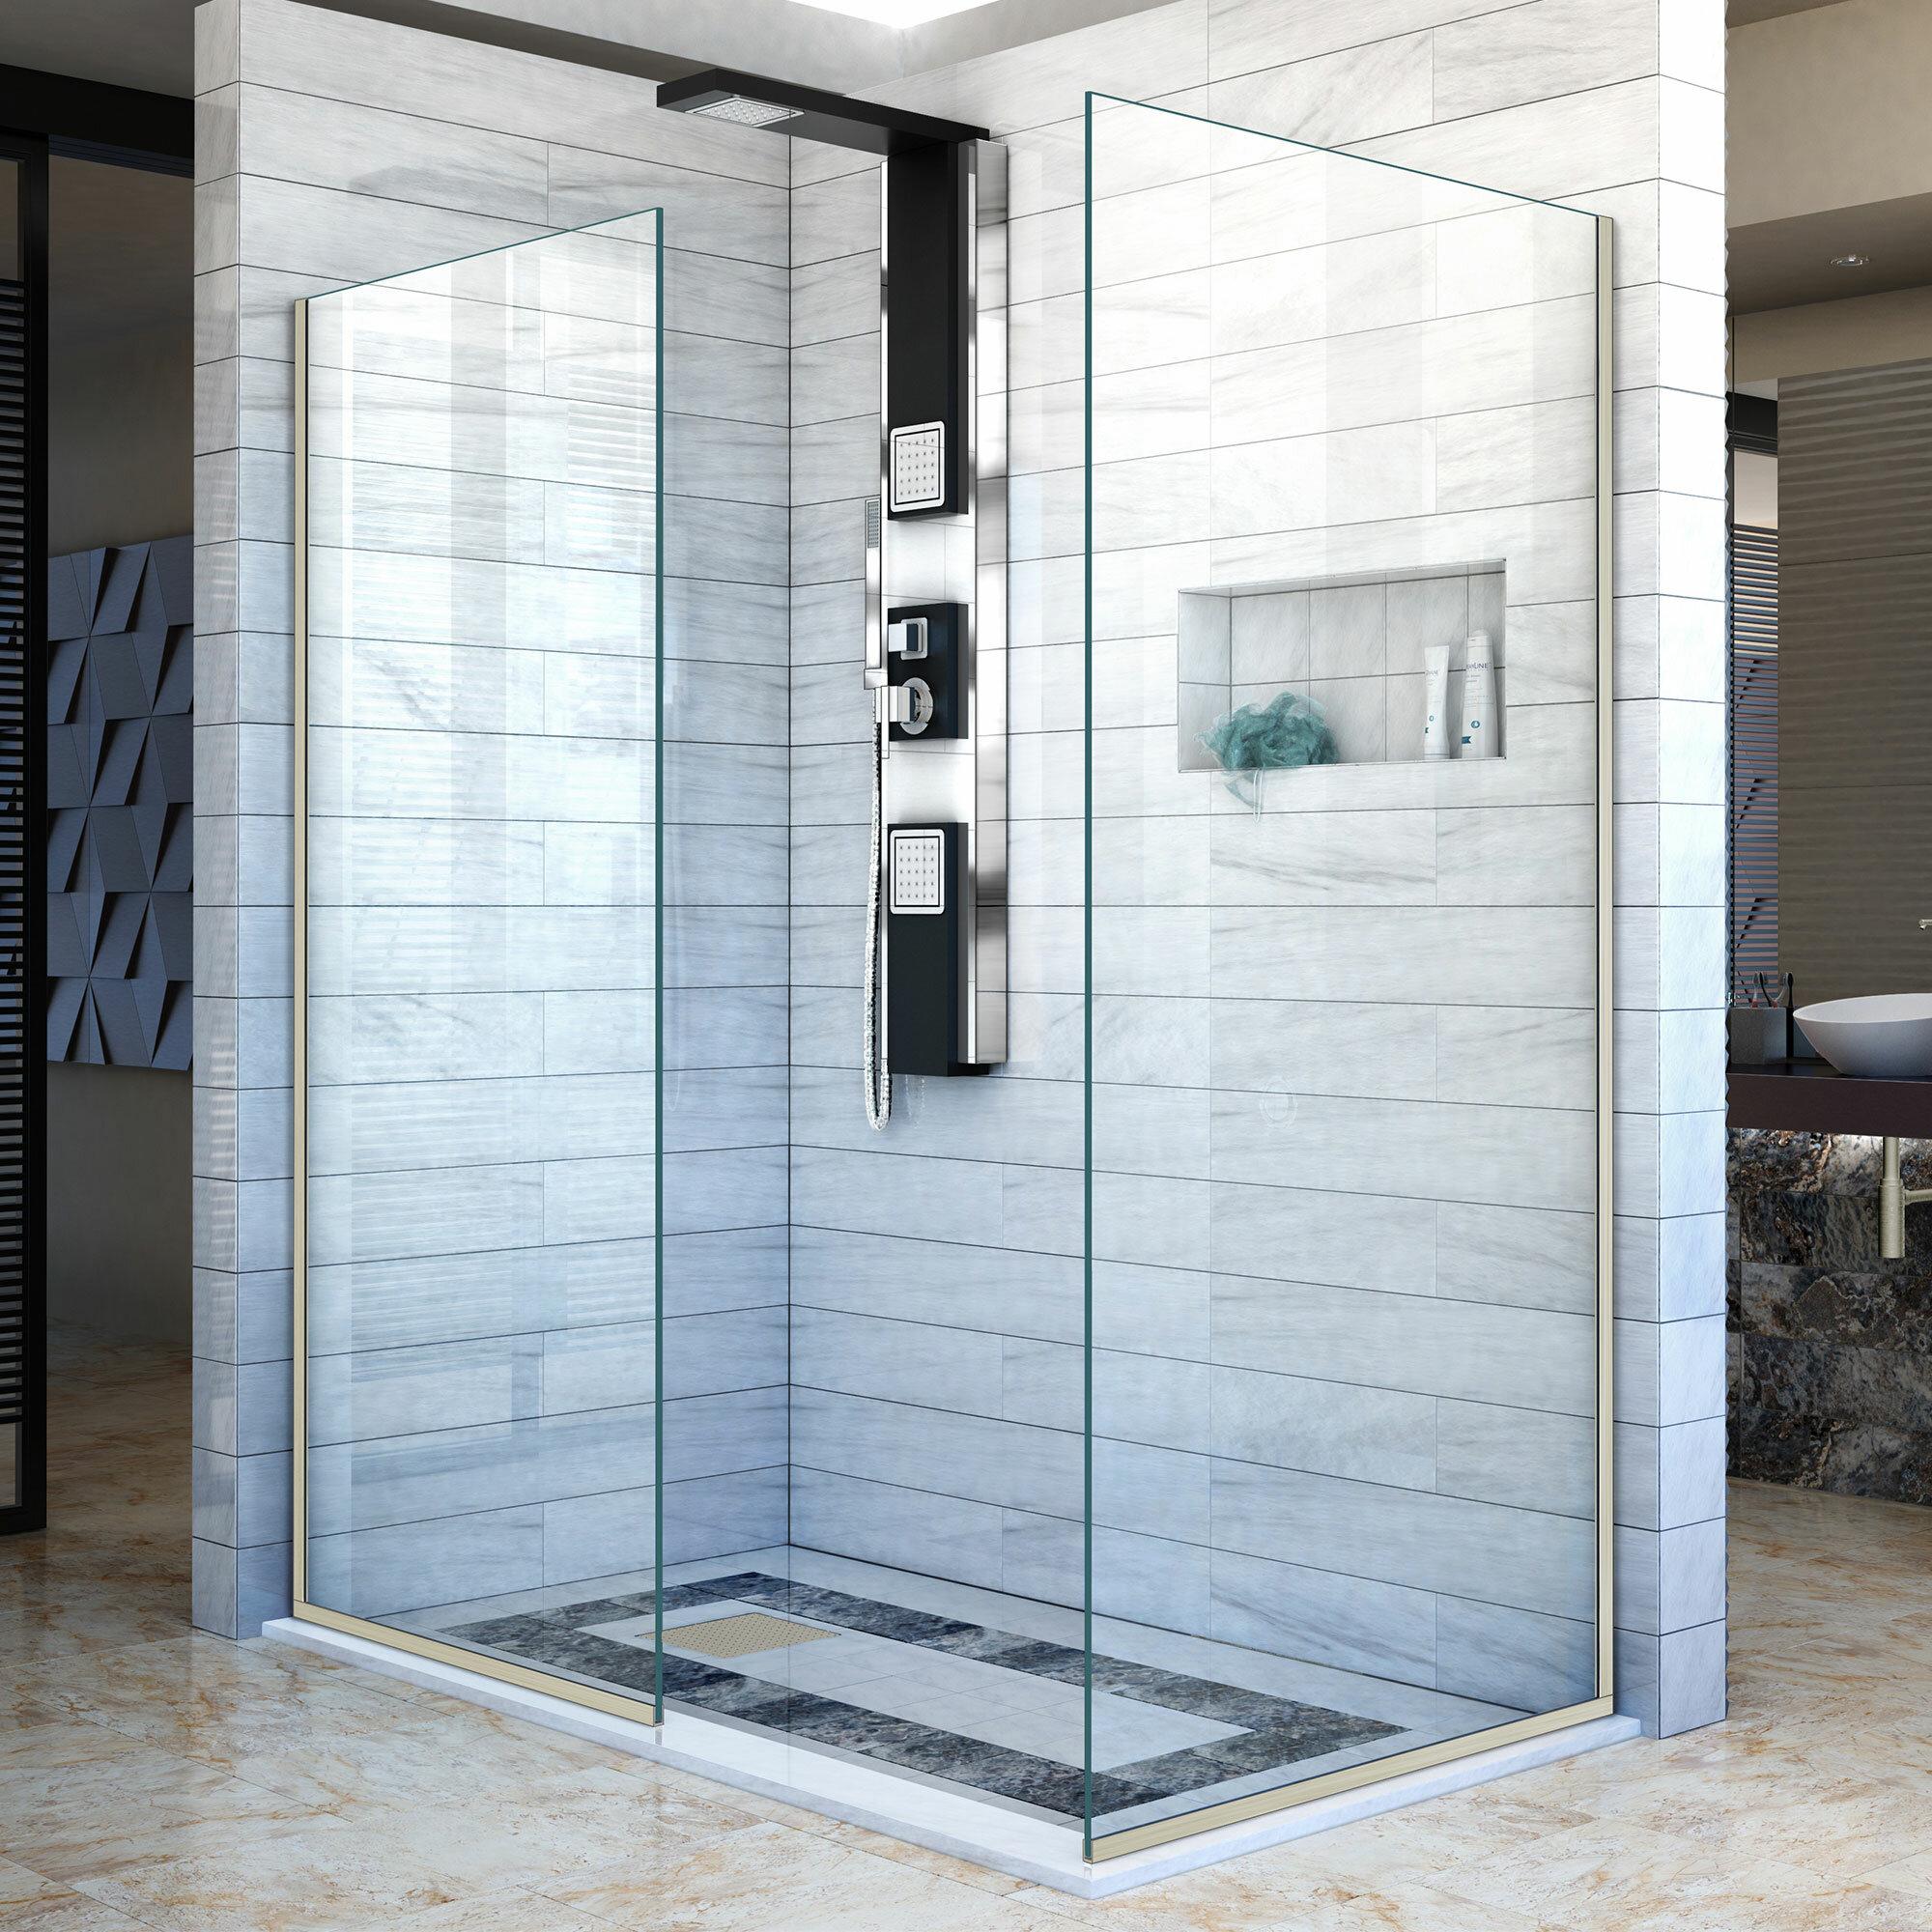 Linea 34 X 72 Semi Frameless Shower Door With Clearmax Technology